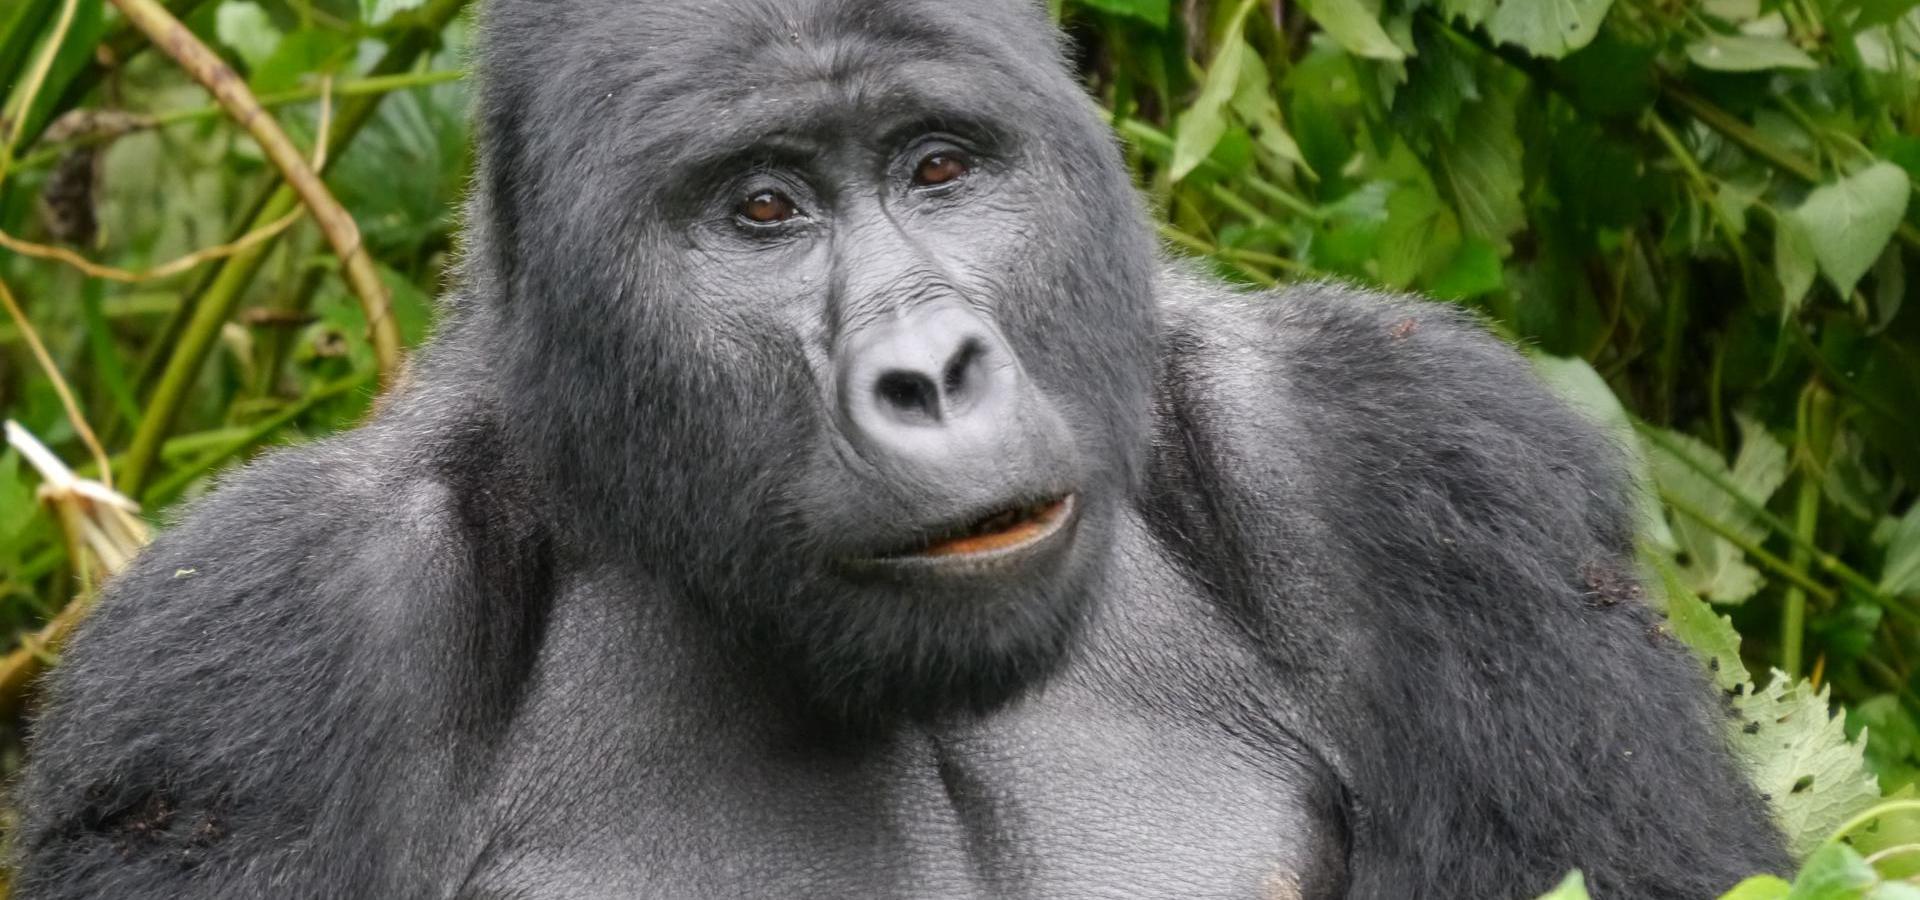 Gorlla Trekking - Uganda Urlaub & Reisen